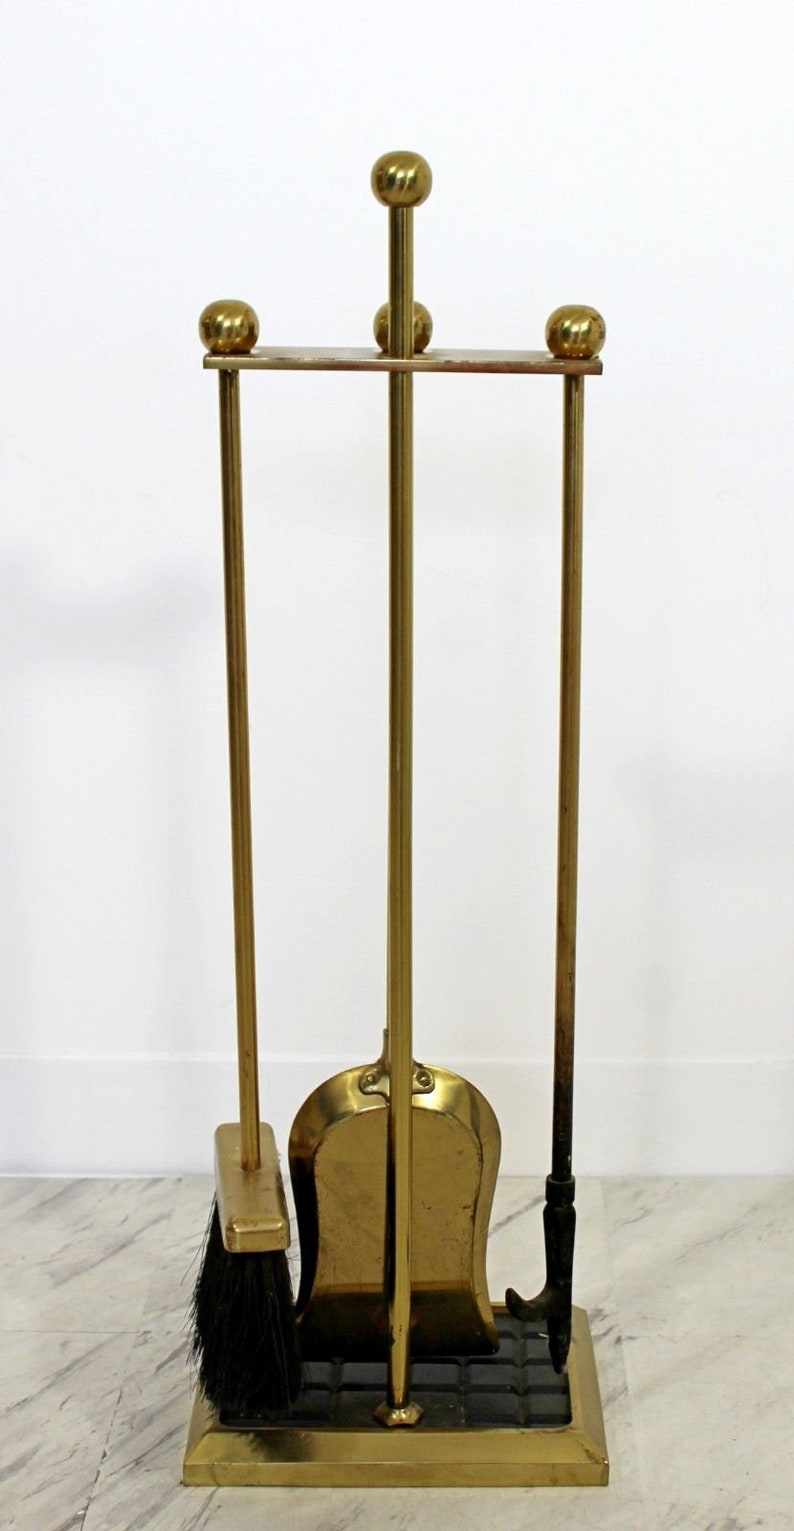 Mid Century Modern Brass Set of Fireplace Tools 1960s Shovel Poker Brush